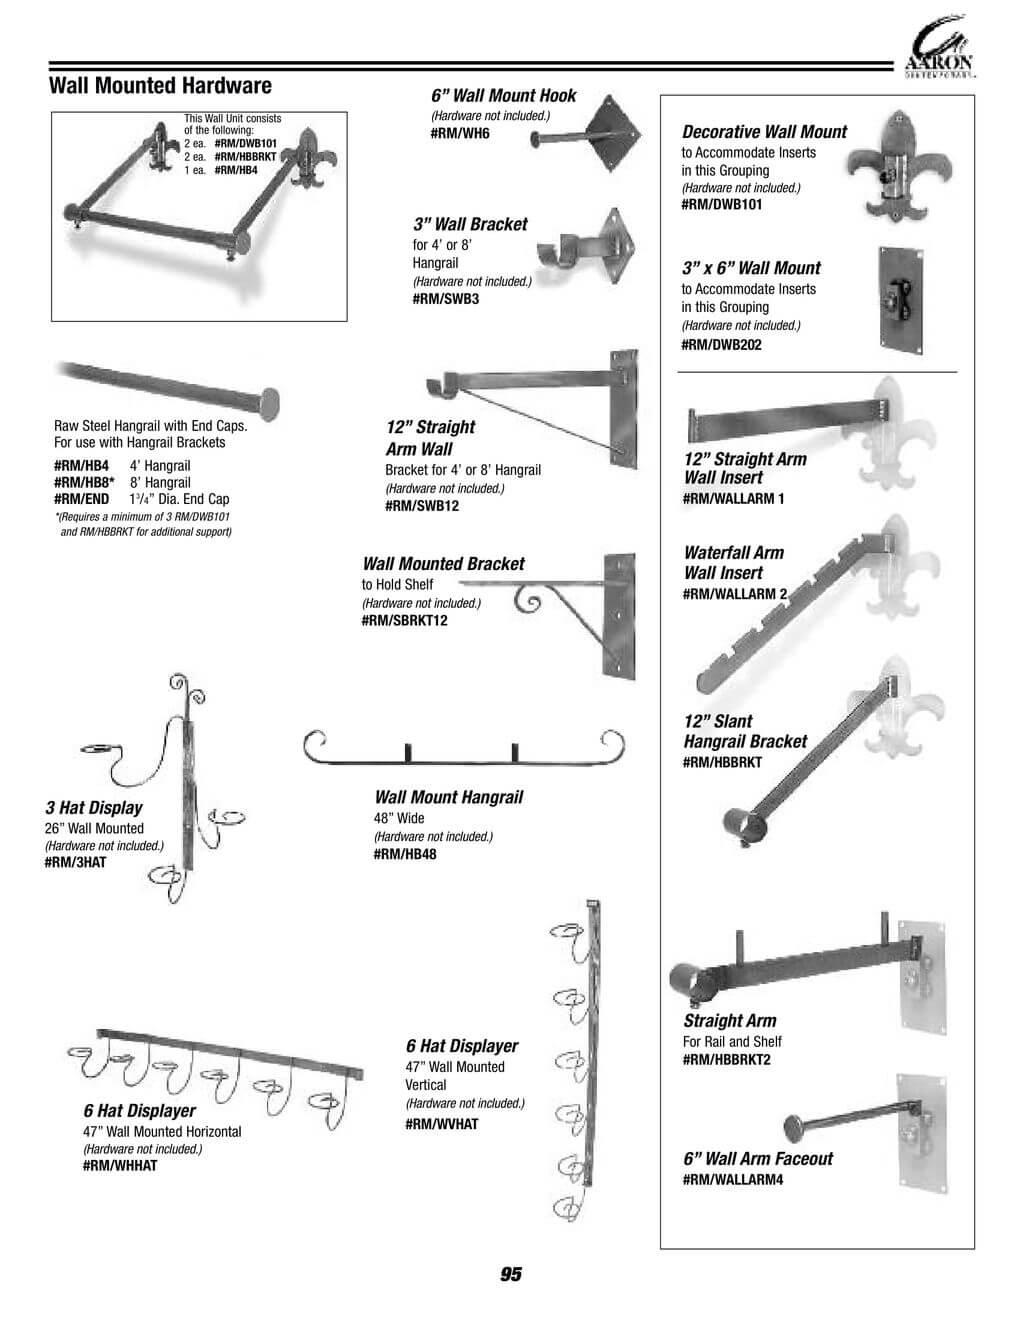 wall mounted hardware